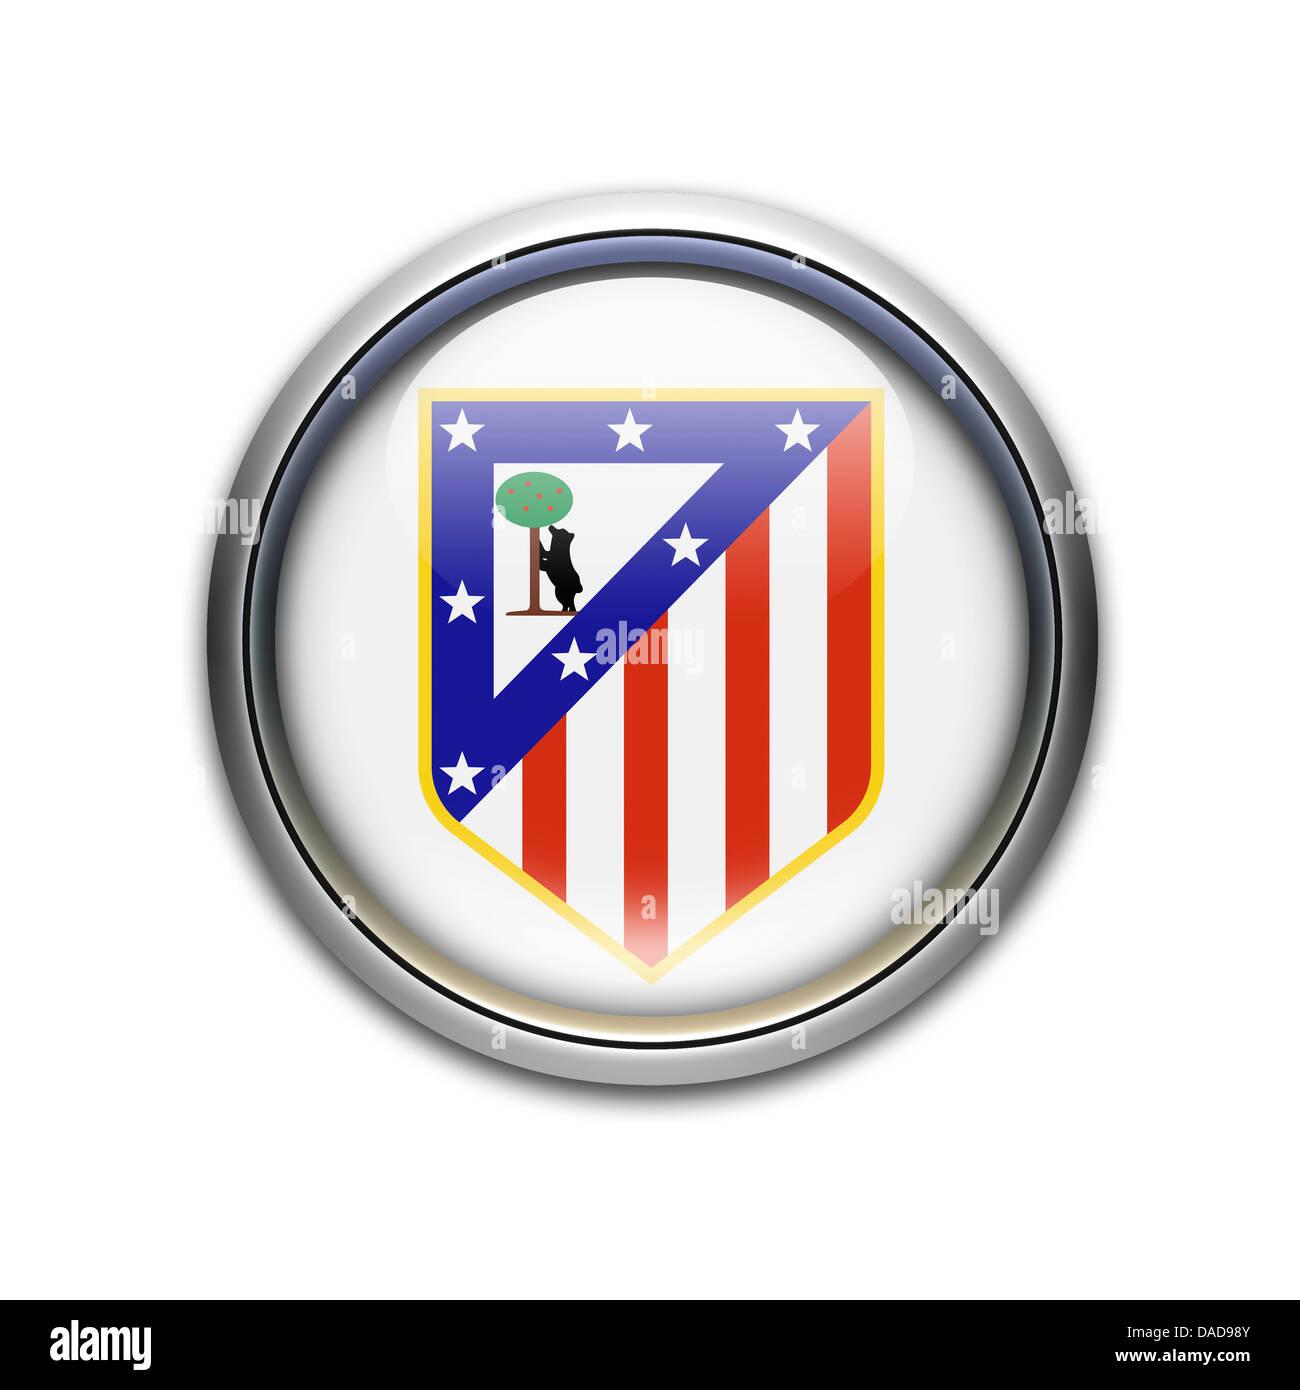 Atletico Madrid Logo Symbol Fahne Emblem Stockfoto Bild 58070347